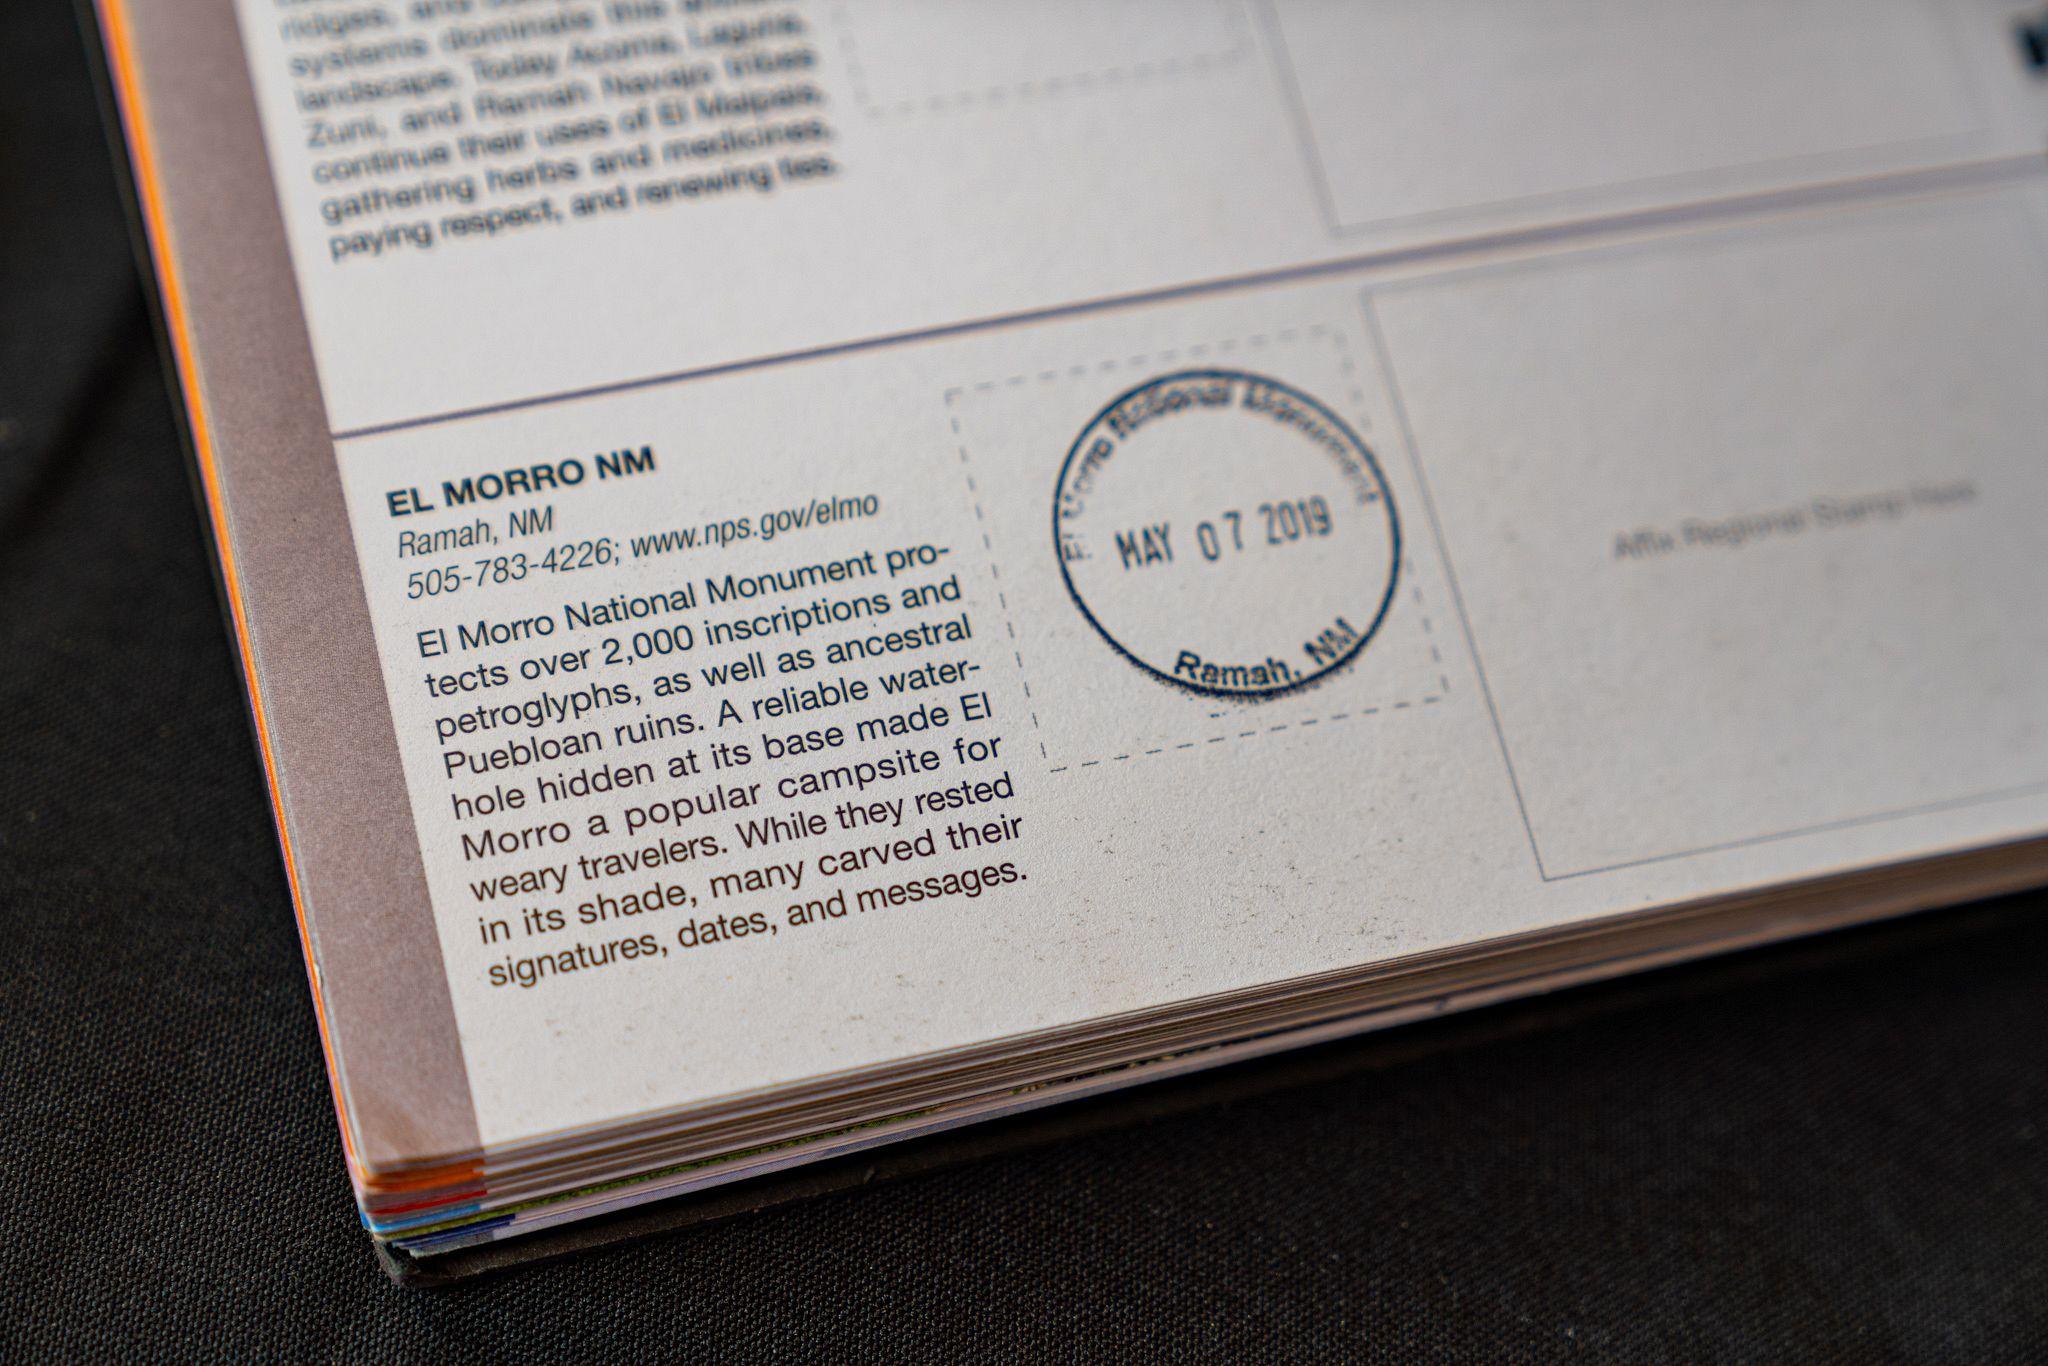 El Morro Passport Stamp